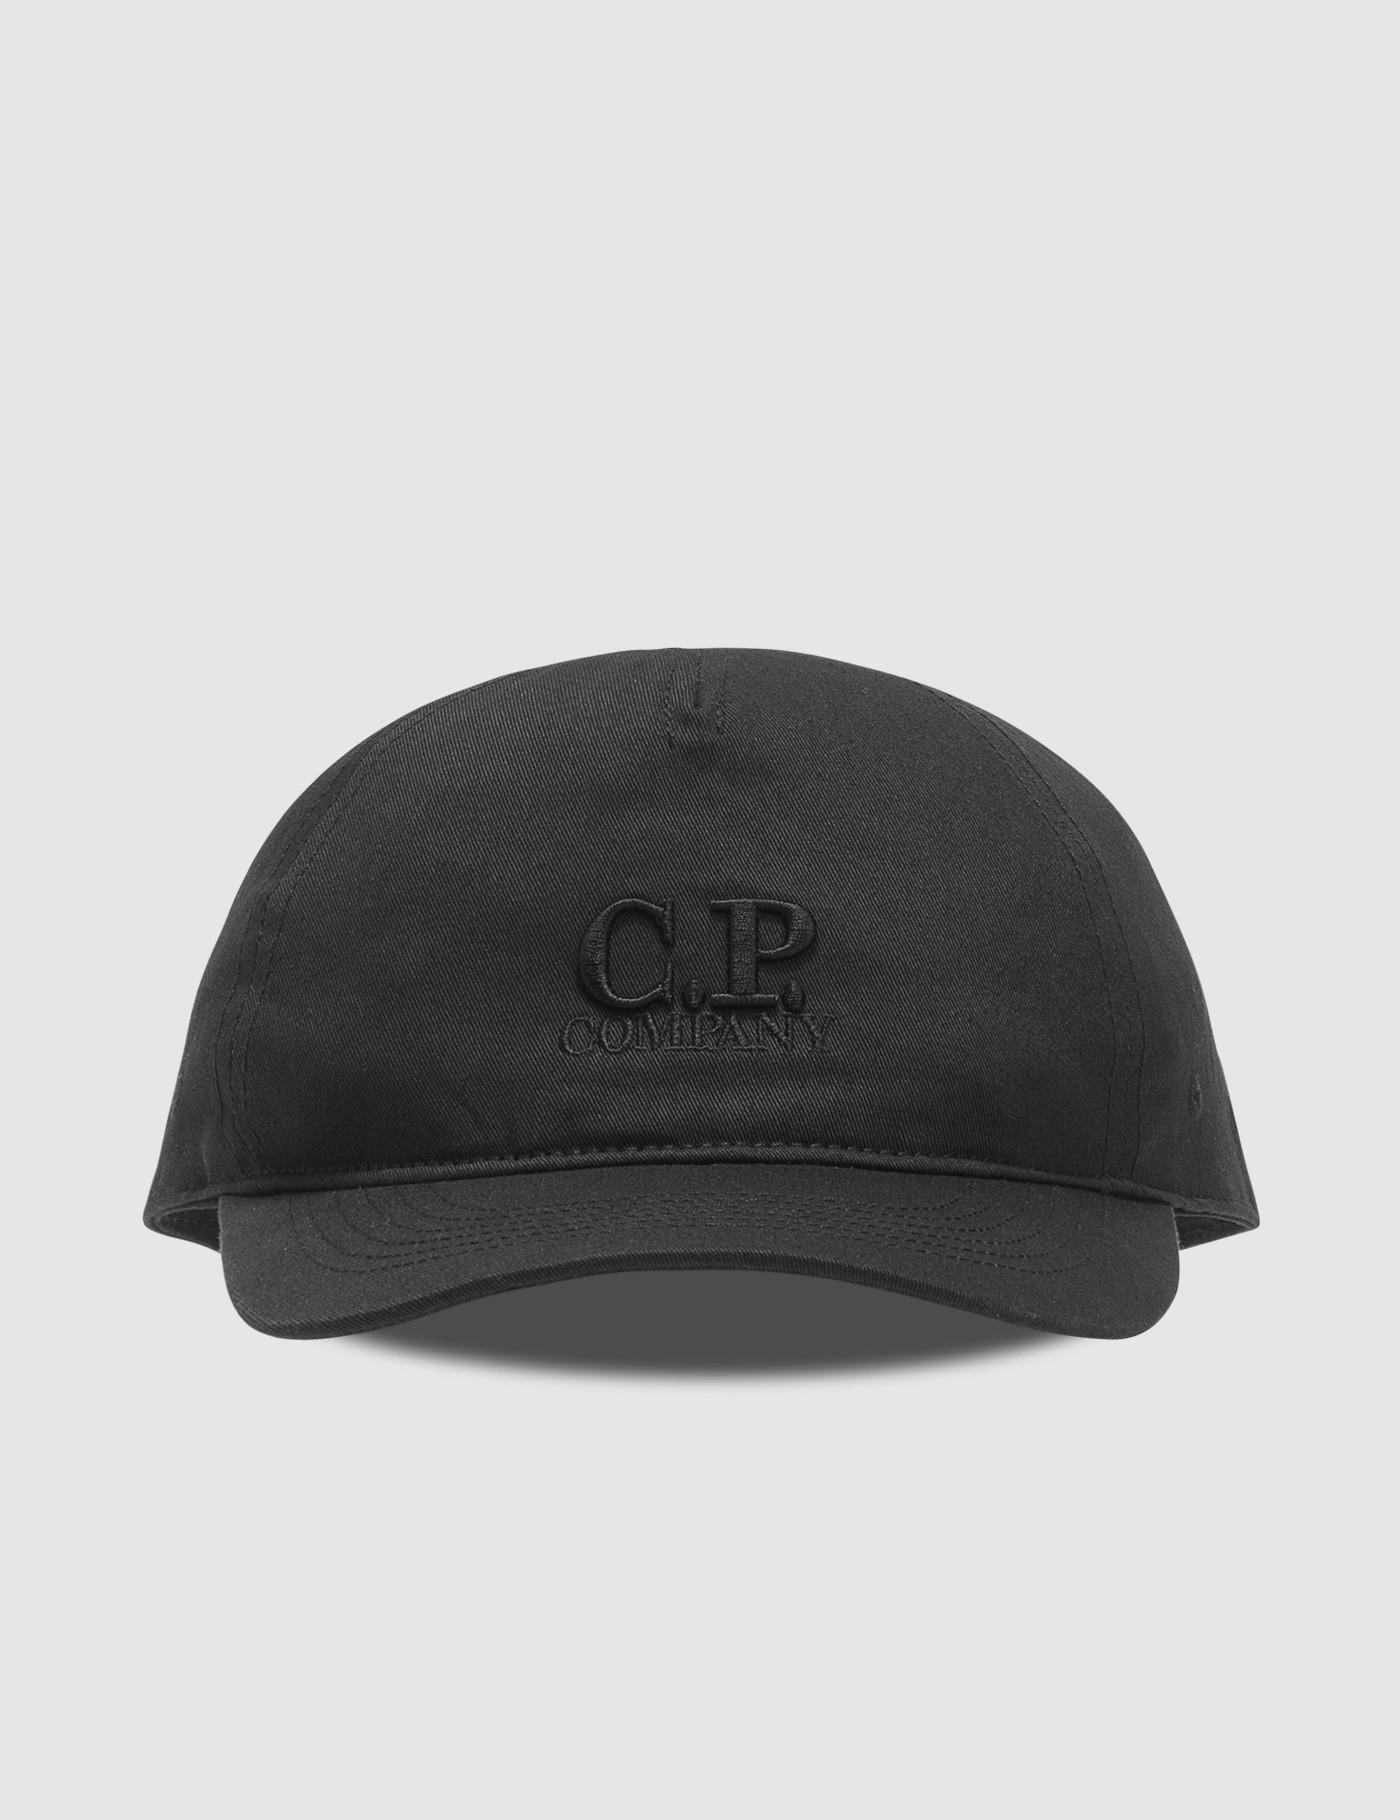 a42b2f20b0b Lyst - C P Company Baseball Cap in Black for Men